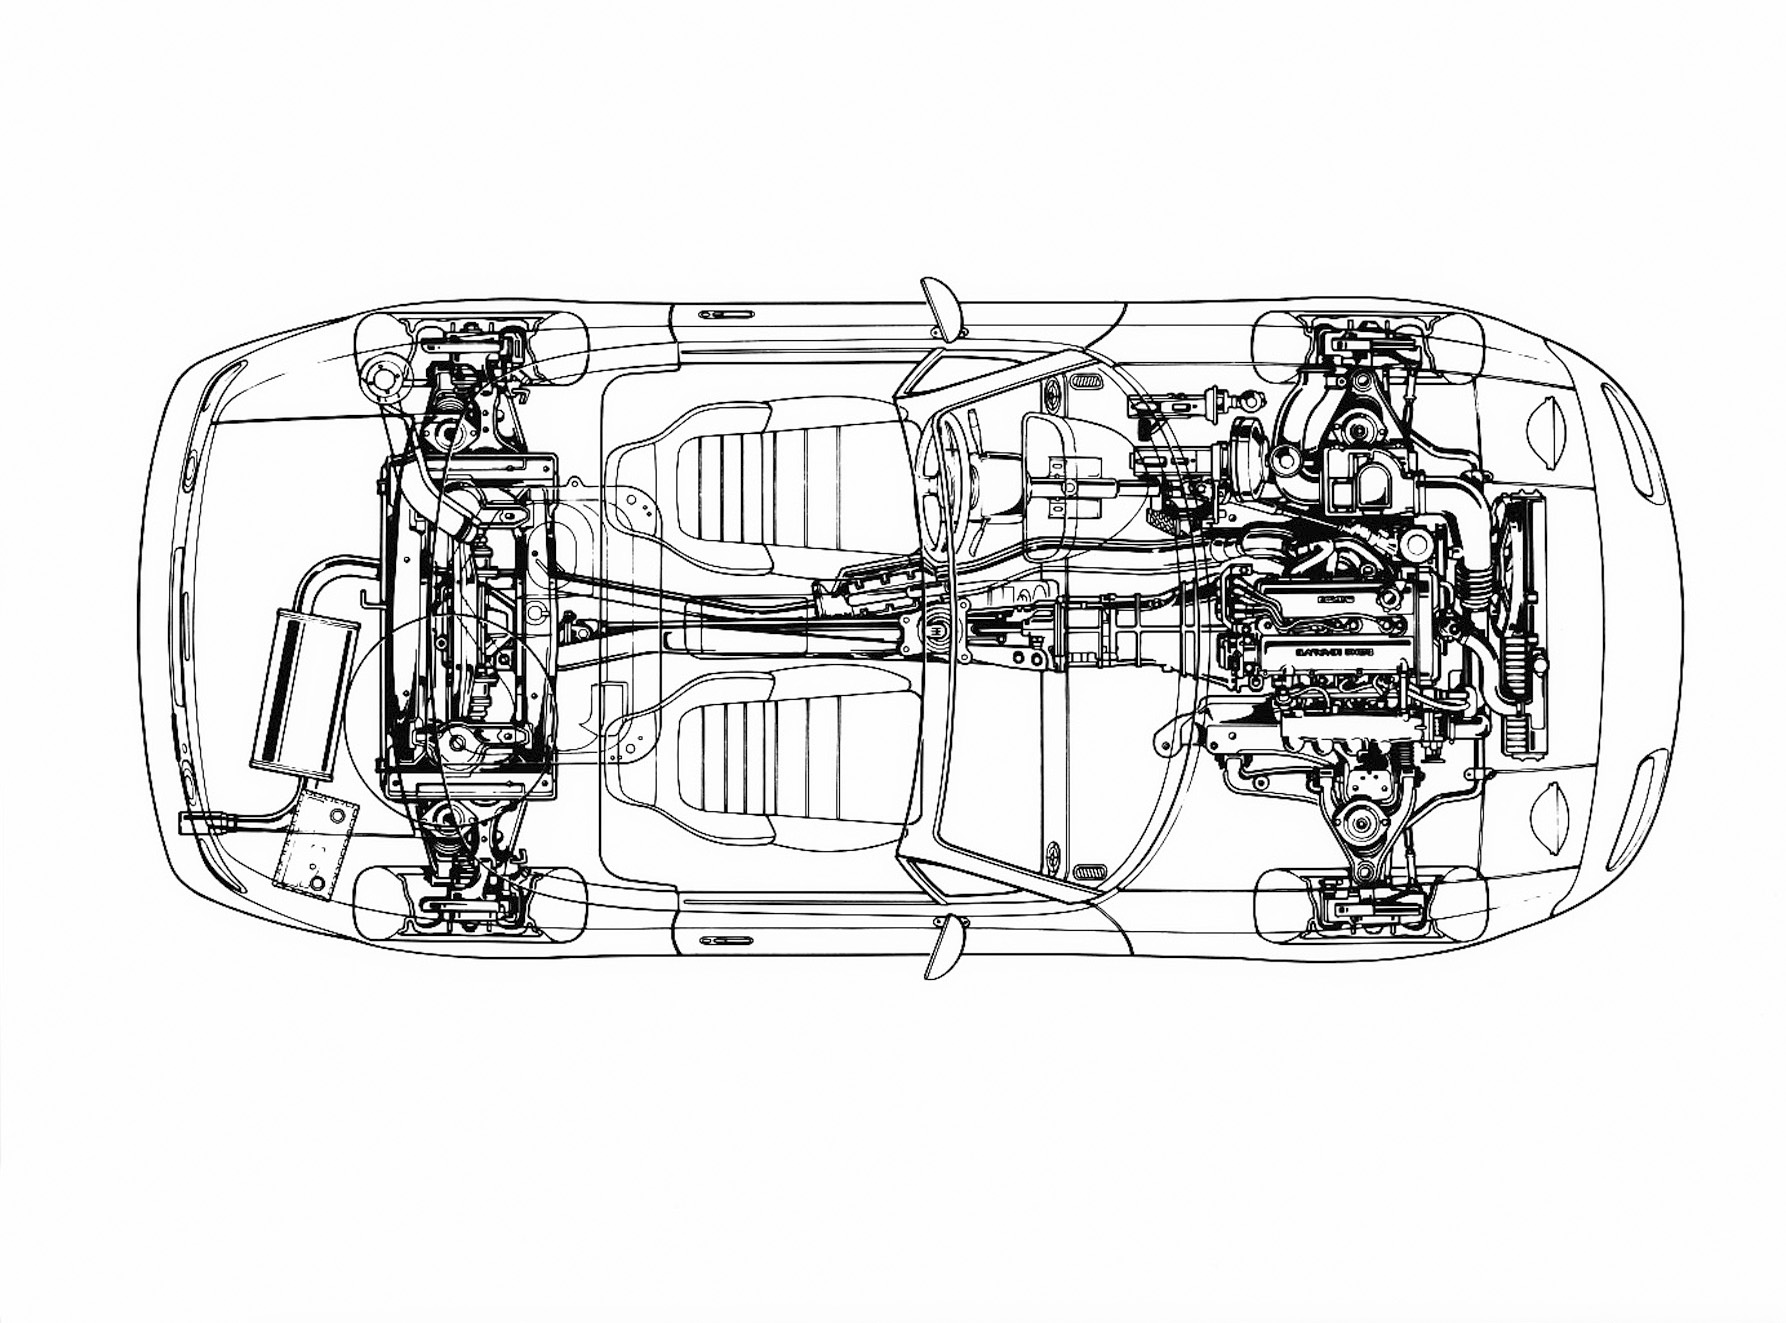 1990 mazda mx5 miata layout chassis seats engine drawing